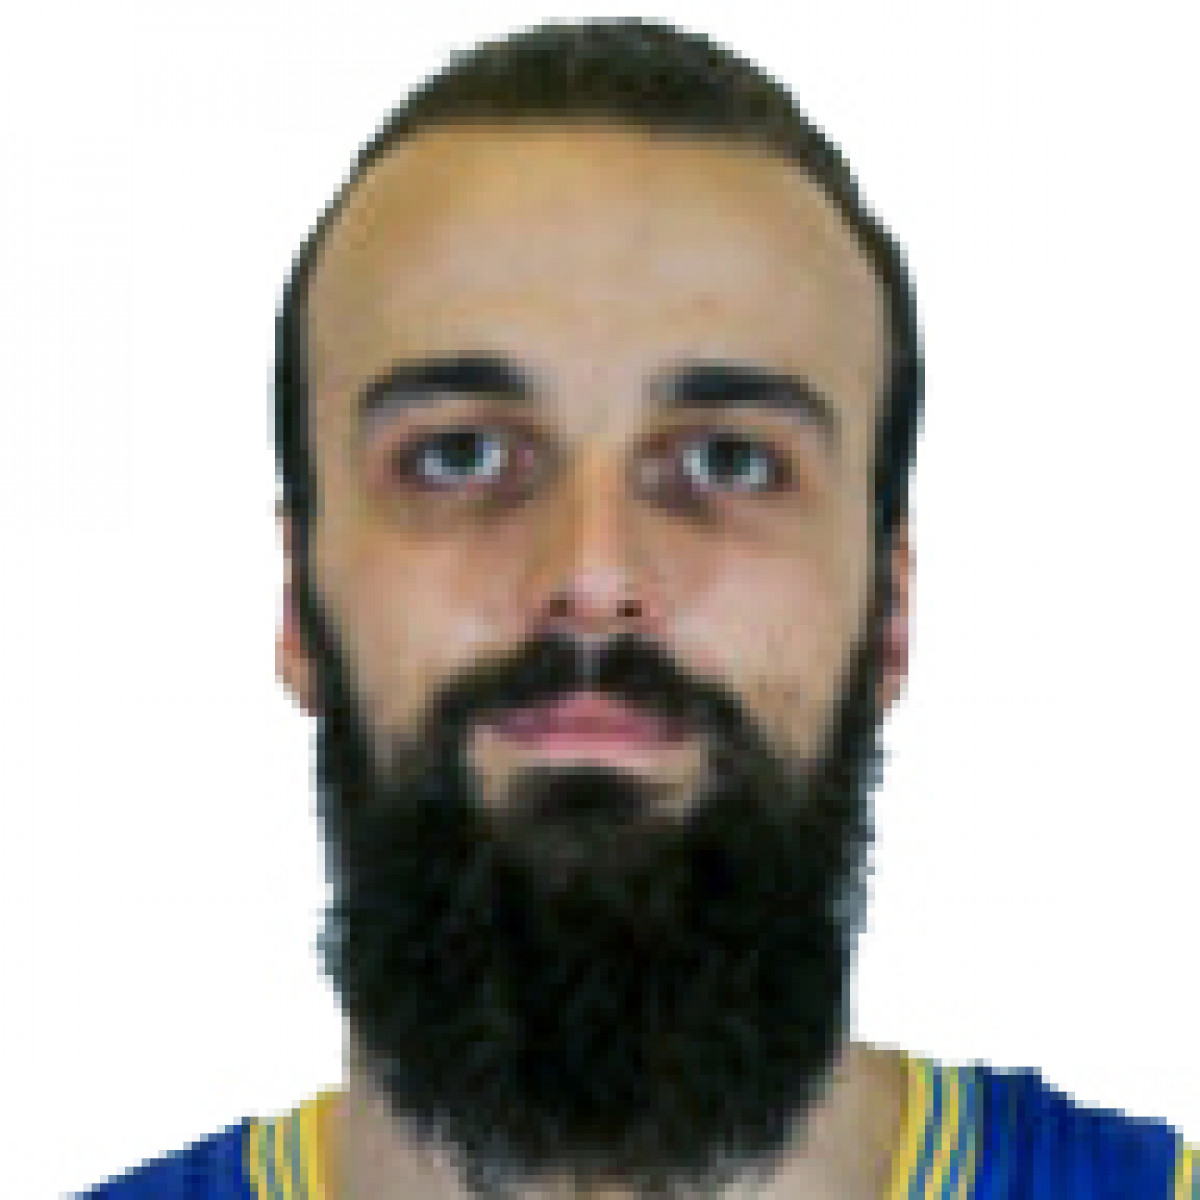 Milojko Vasilic